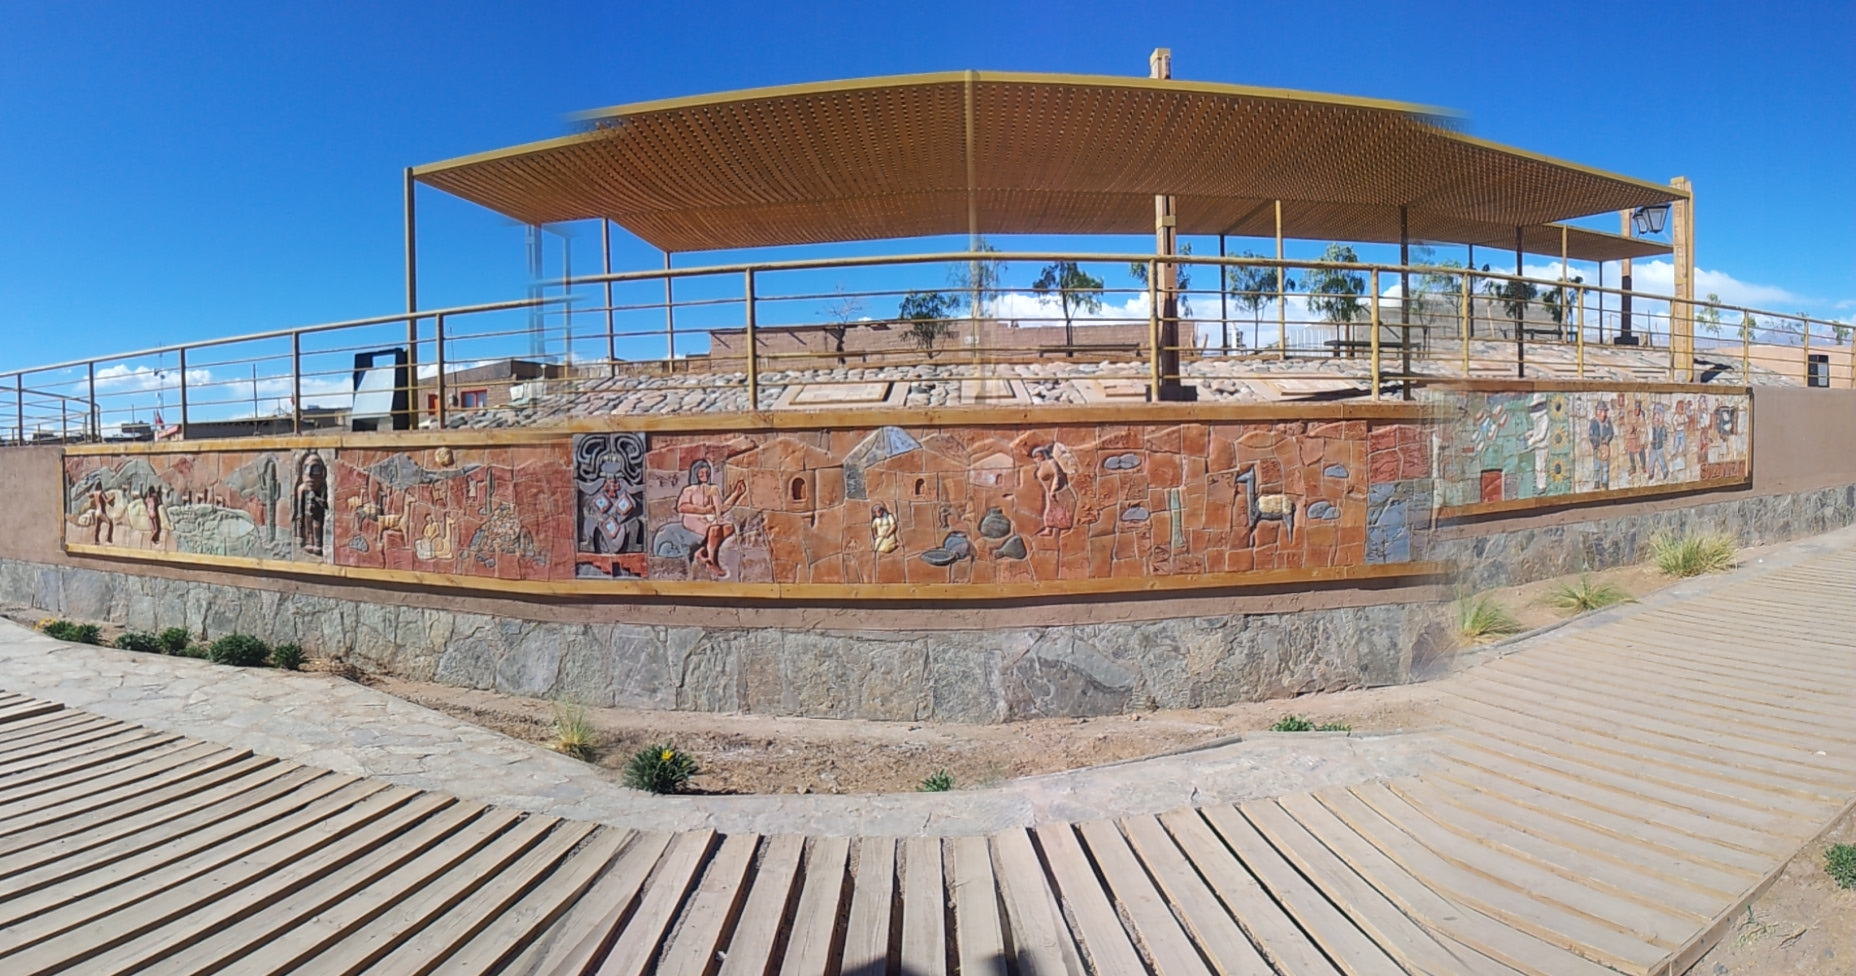 Keramik an der Mauer, Likanantai-Motive, Atacama la Grande